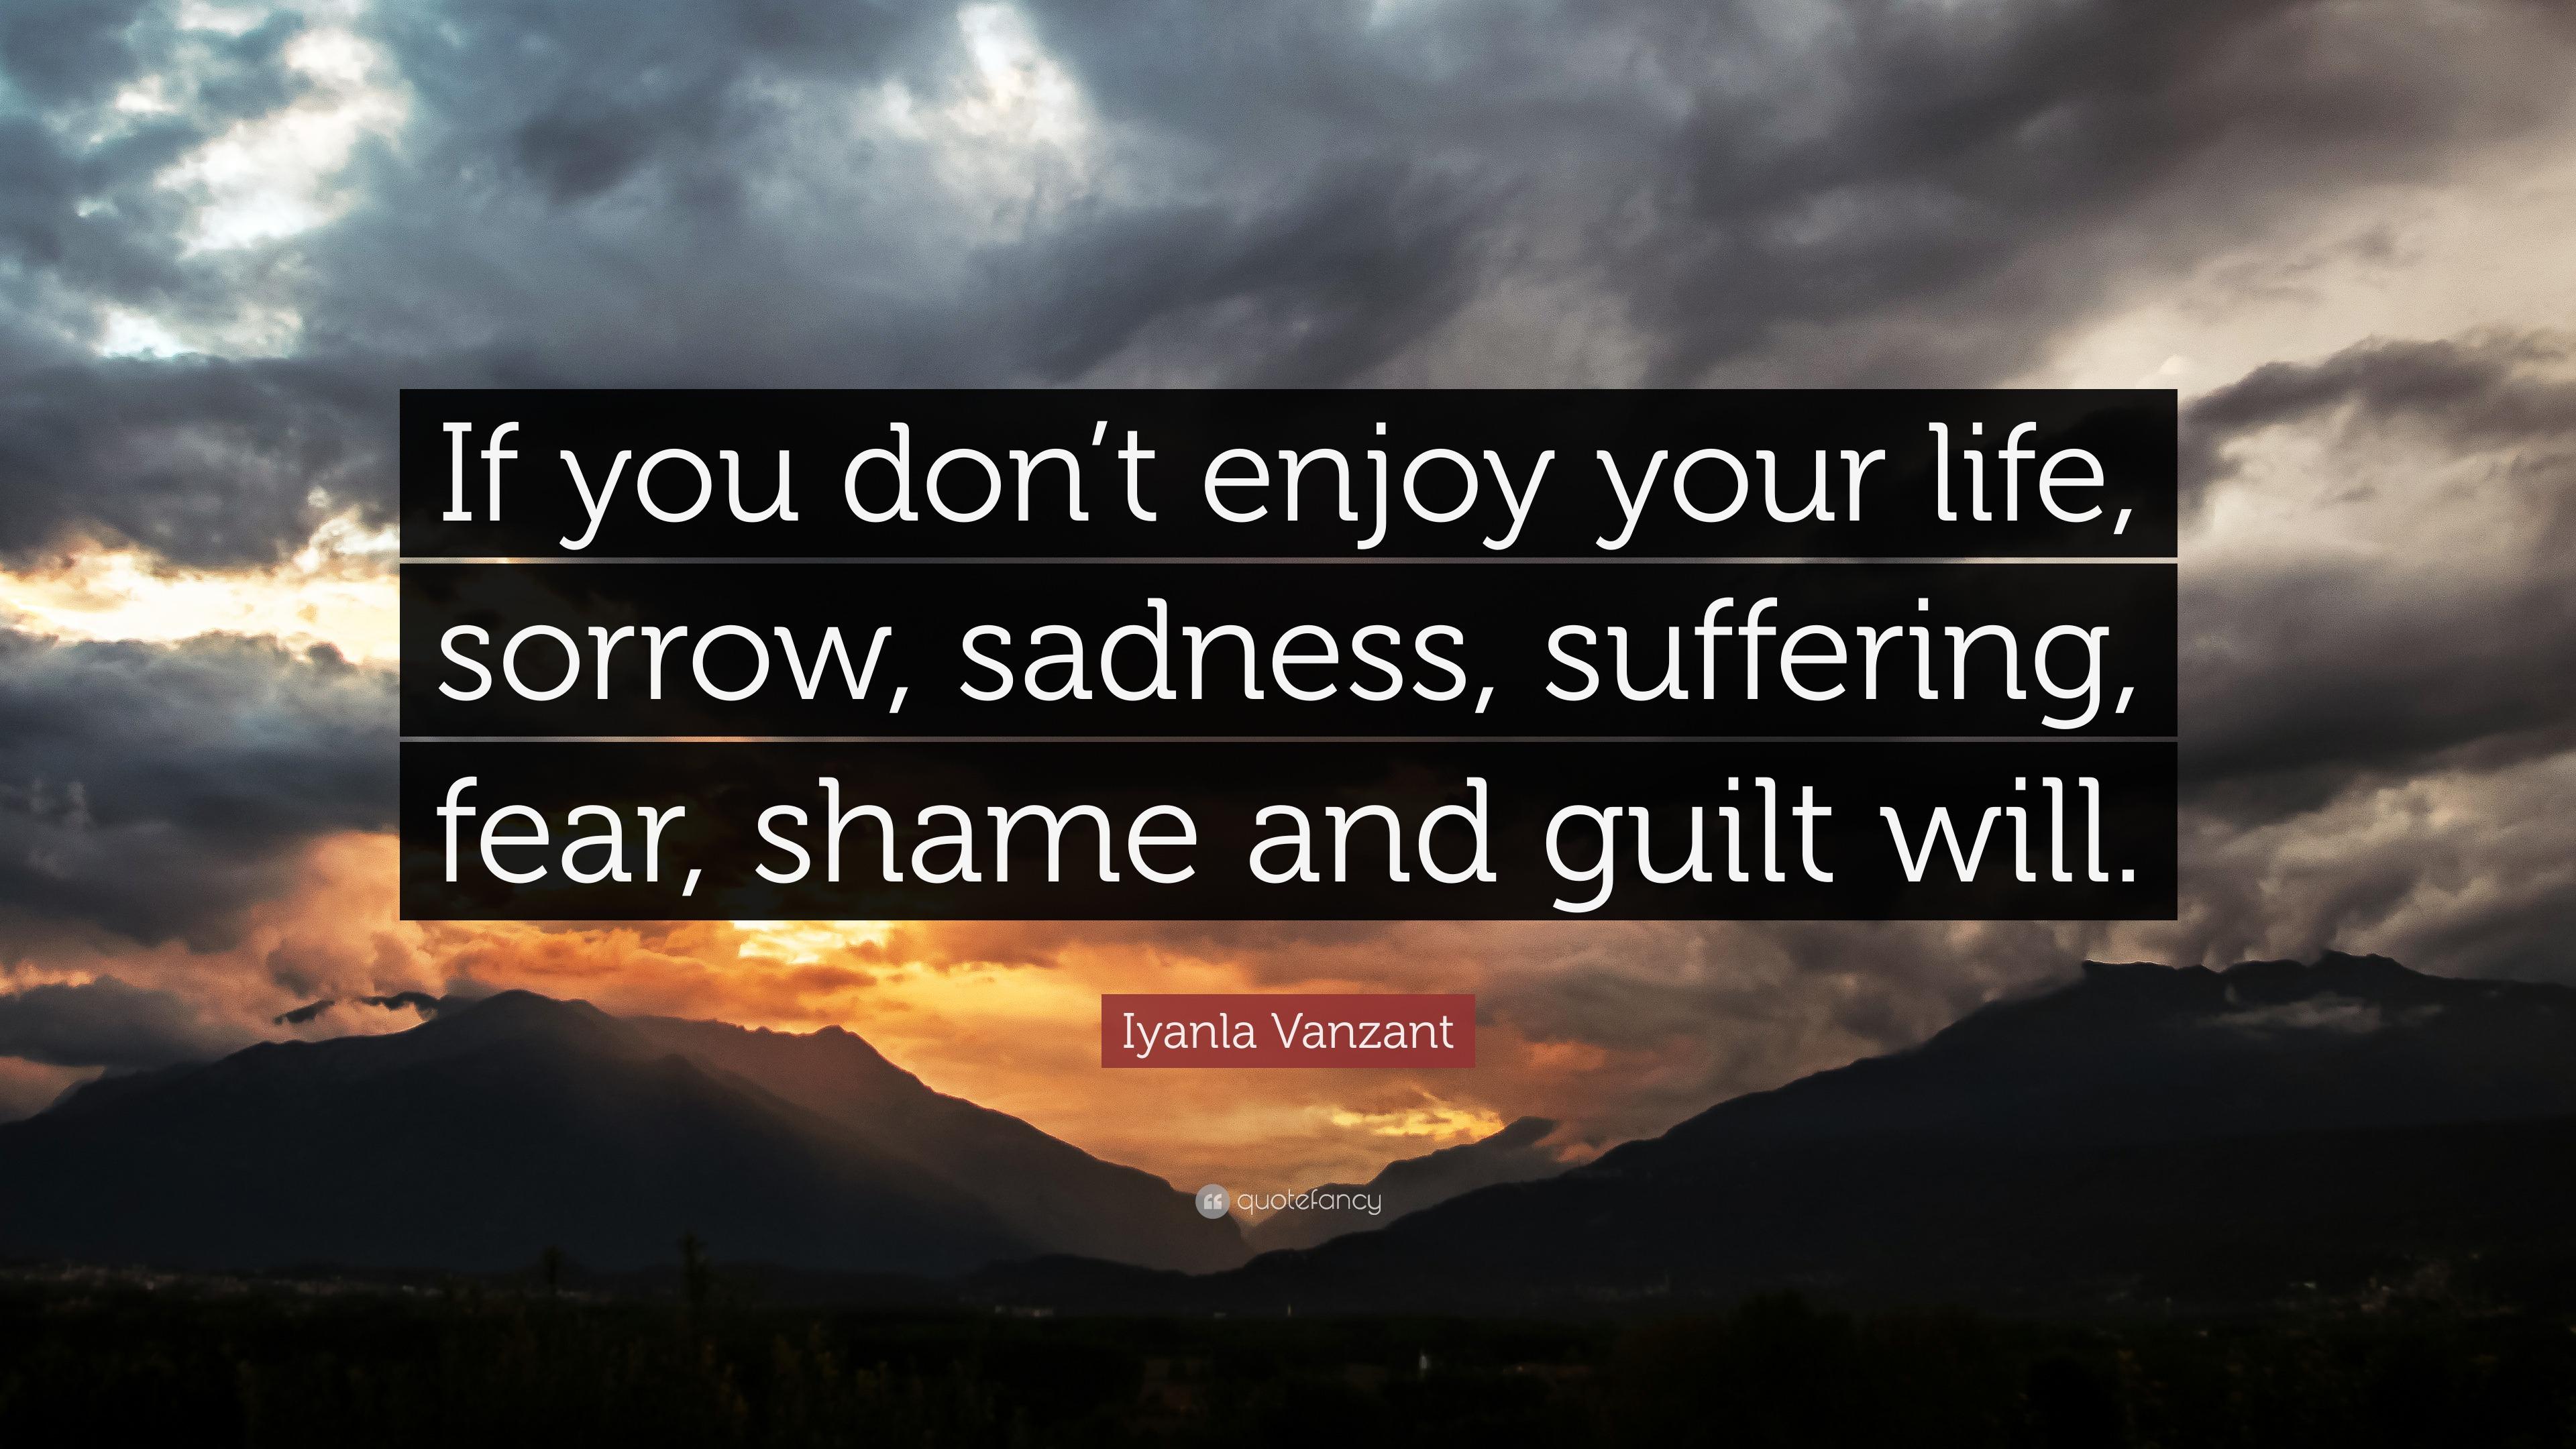 life and sorrow